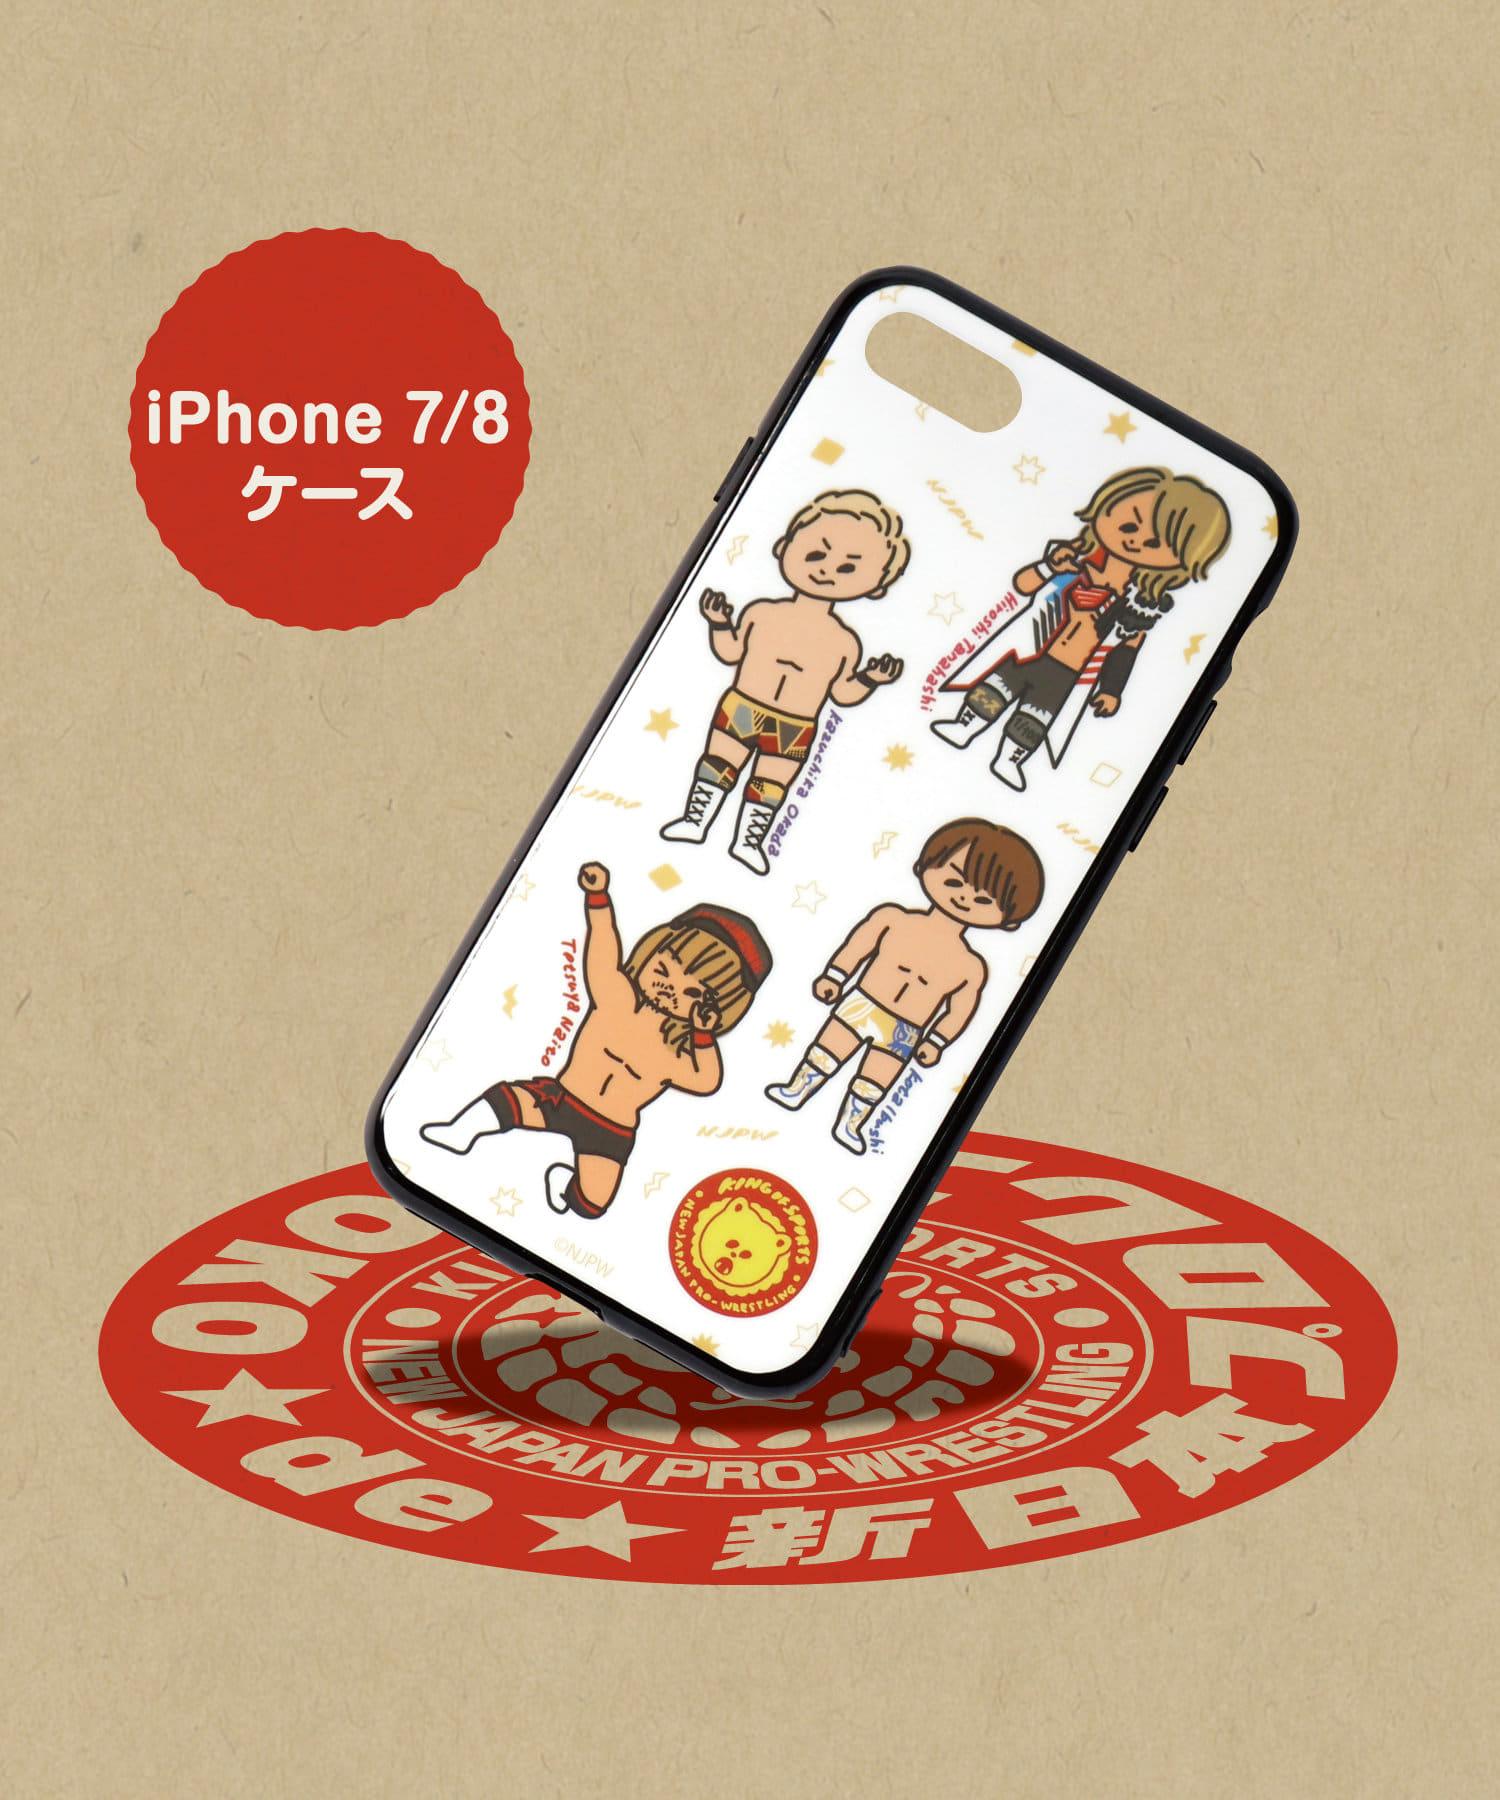 ASOKO(アソコ) ライフスタイル 【ASOKO de 新日本プロレス】iPhone7・8ケース その他